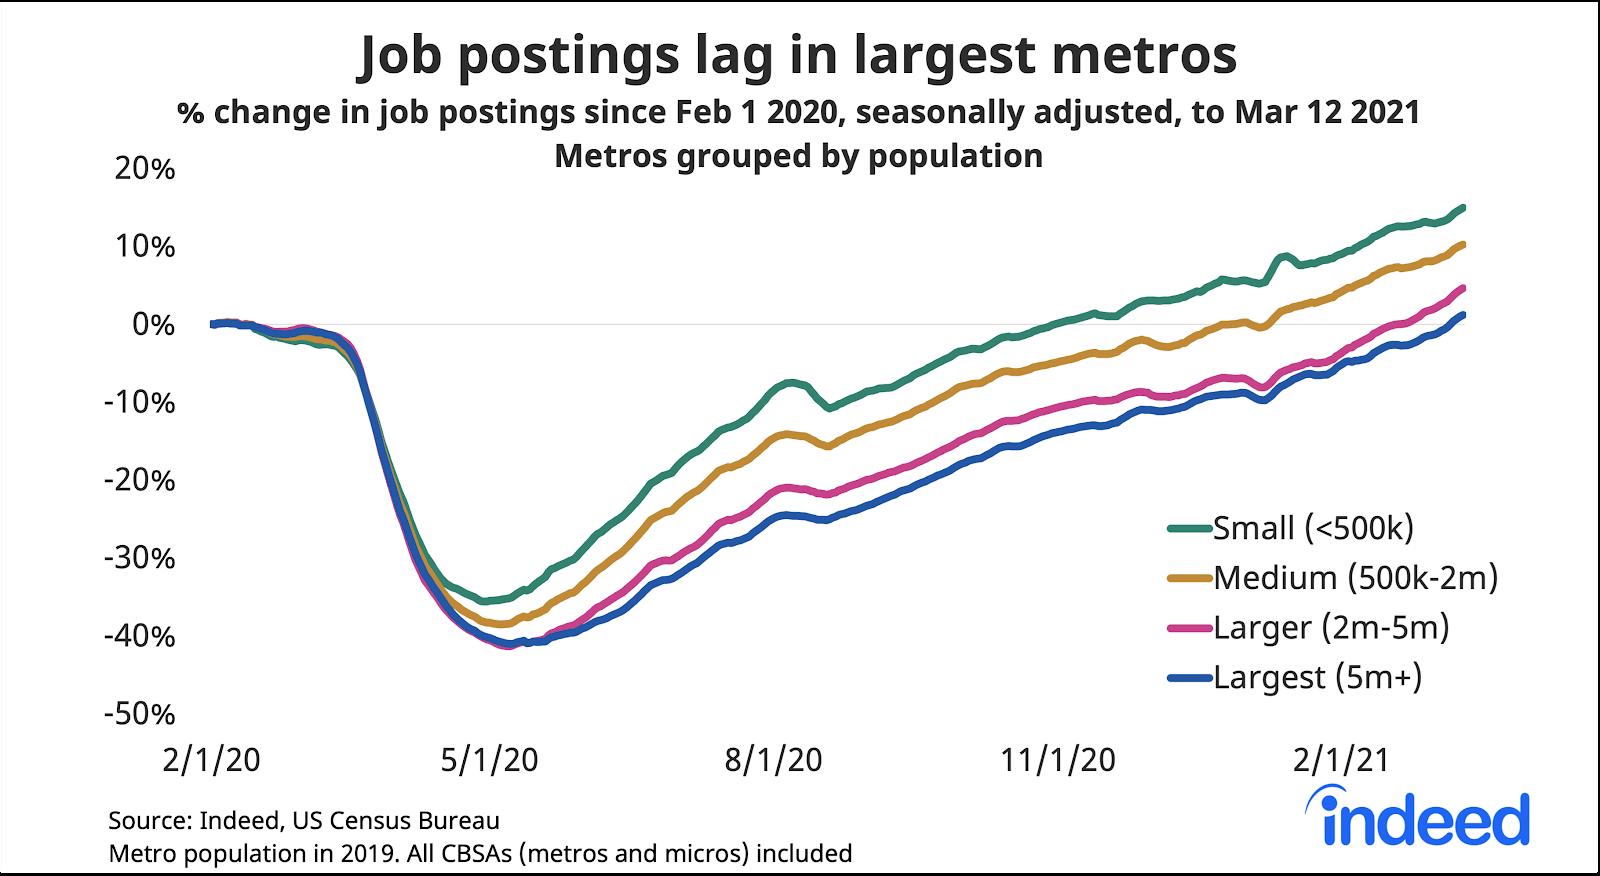 Line graph showing job postings lag in largest metros